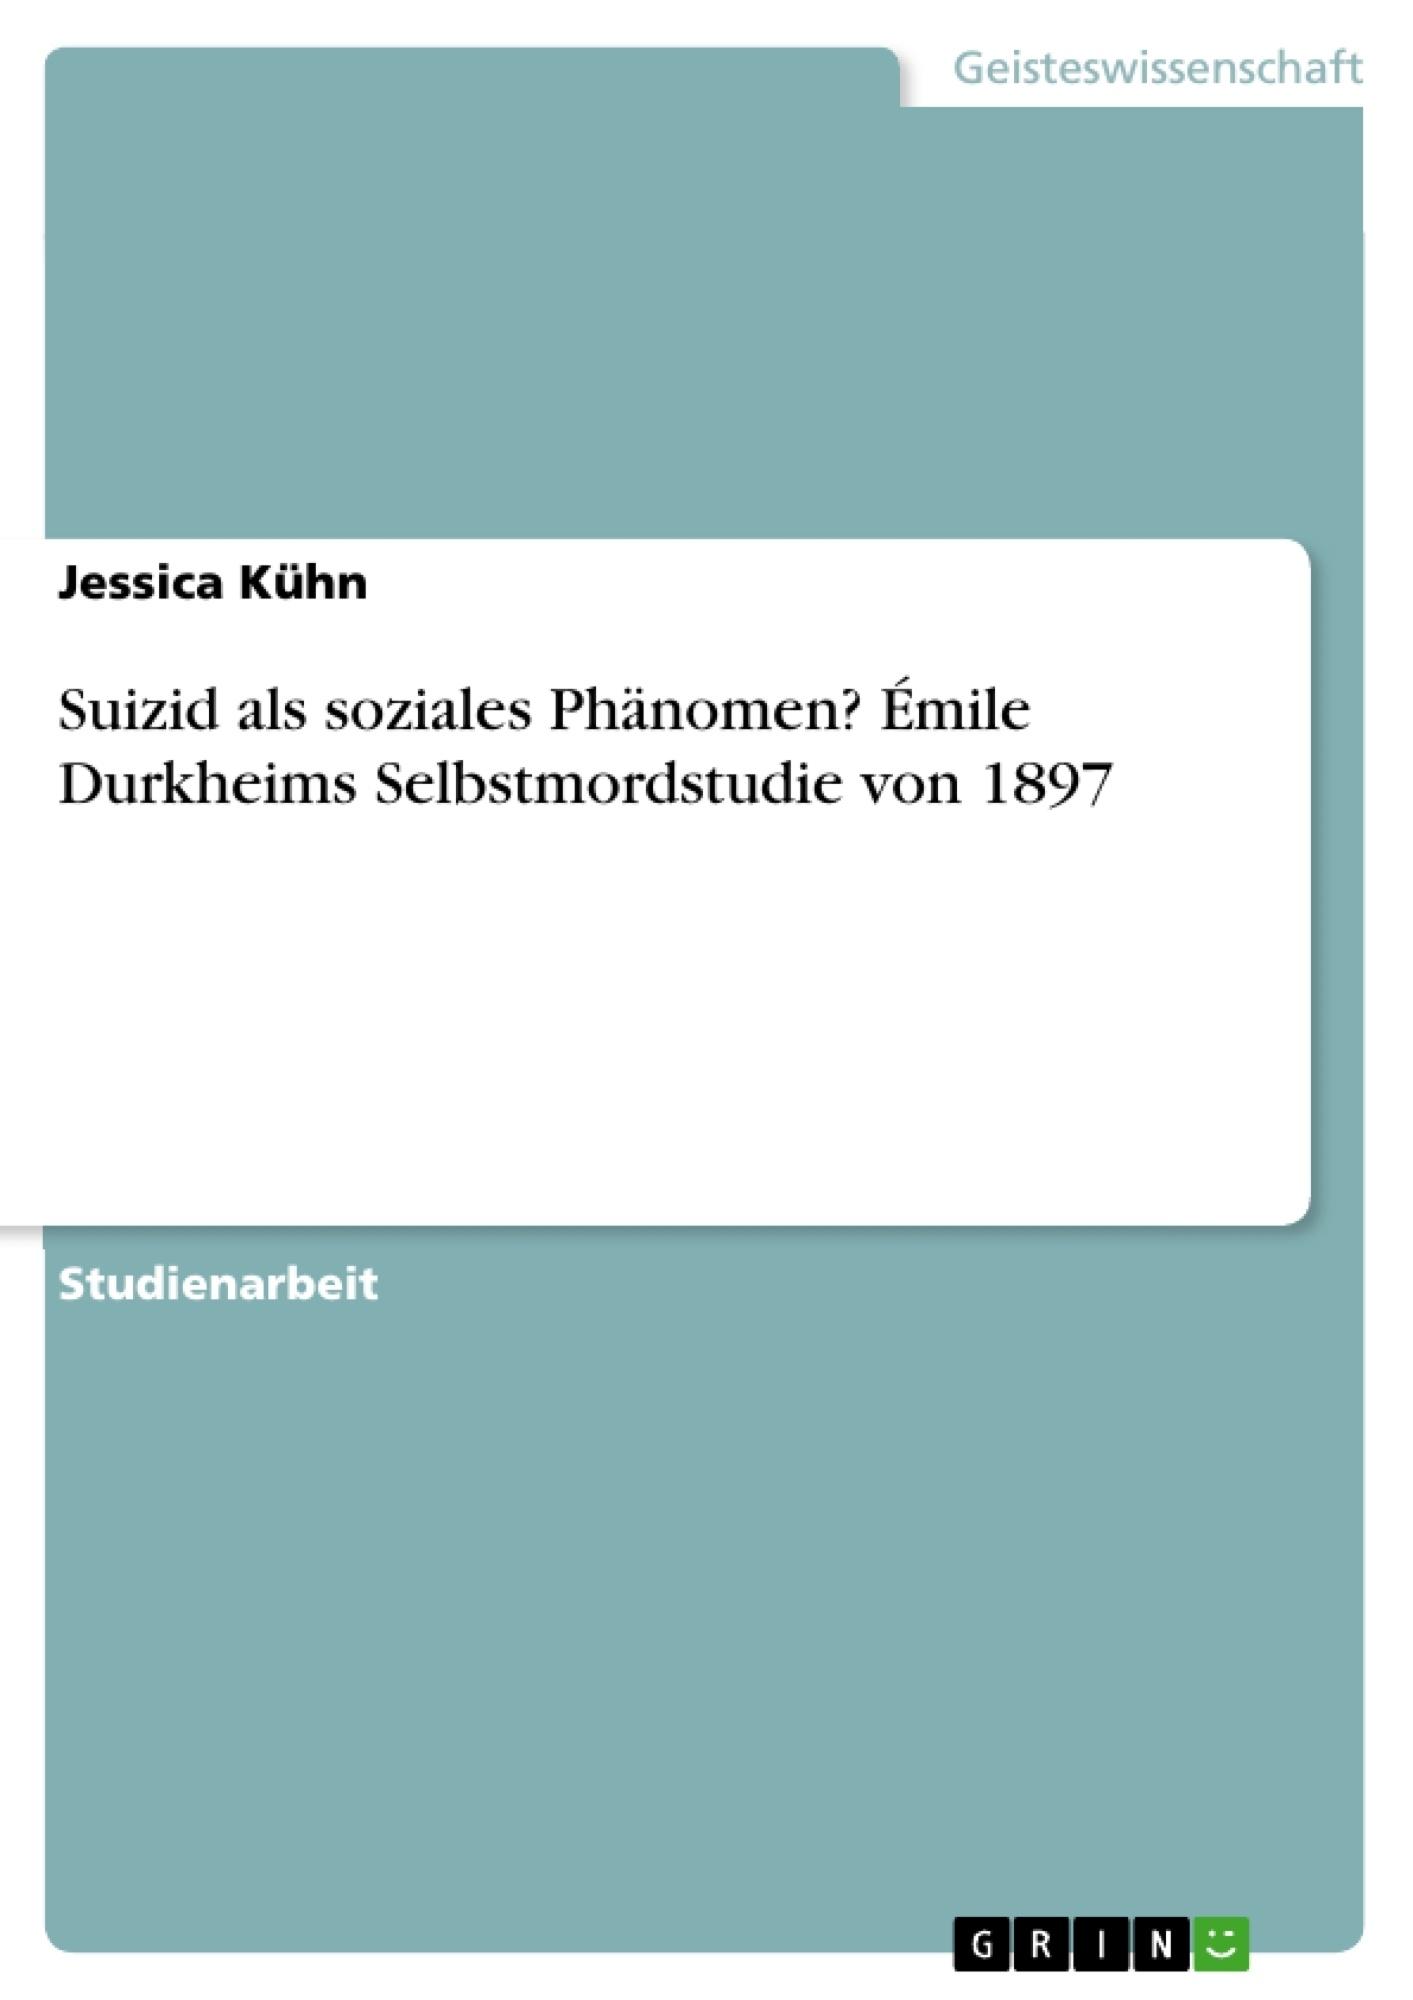 Titel: Suizid als soziales Phänomen? Émile Durkheims Selbstmordstudie von 1897